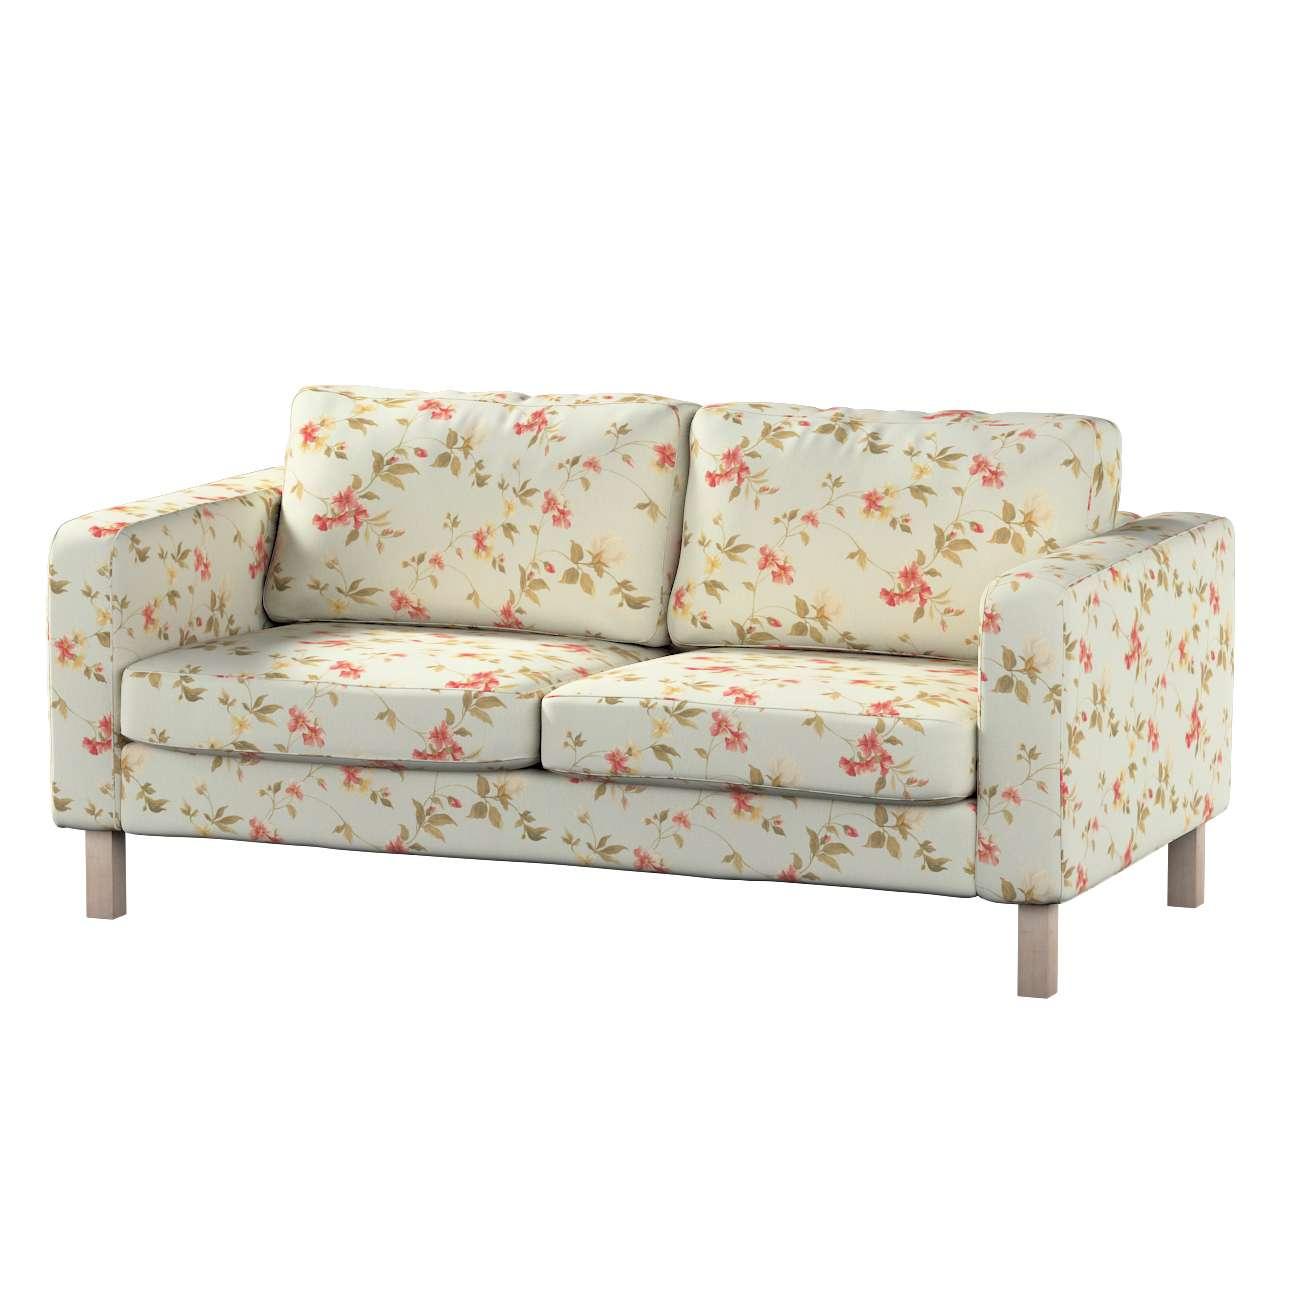 KARSLTAD dvivietės sofos užvalkalas Karlstad 2-vietės sofos užvalkalas kolekcijoje Londres, audinys: 124-65